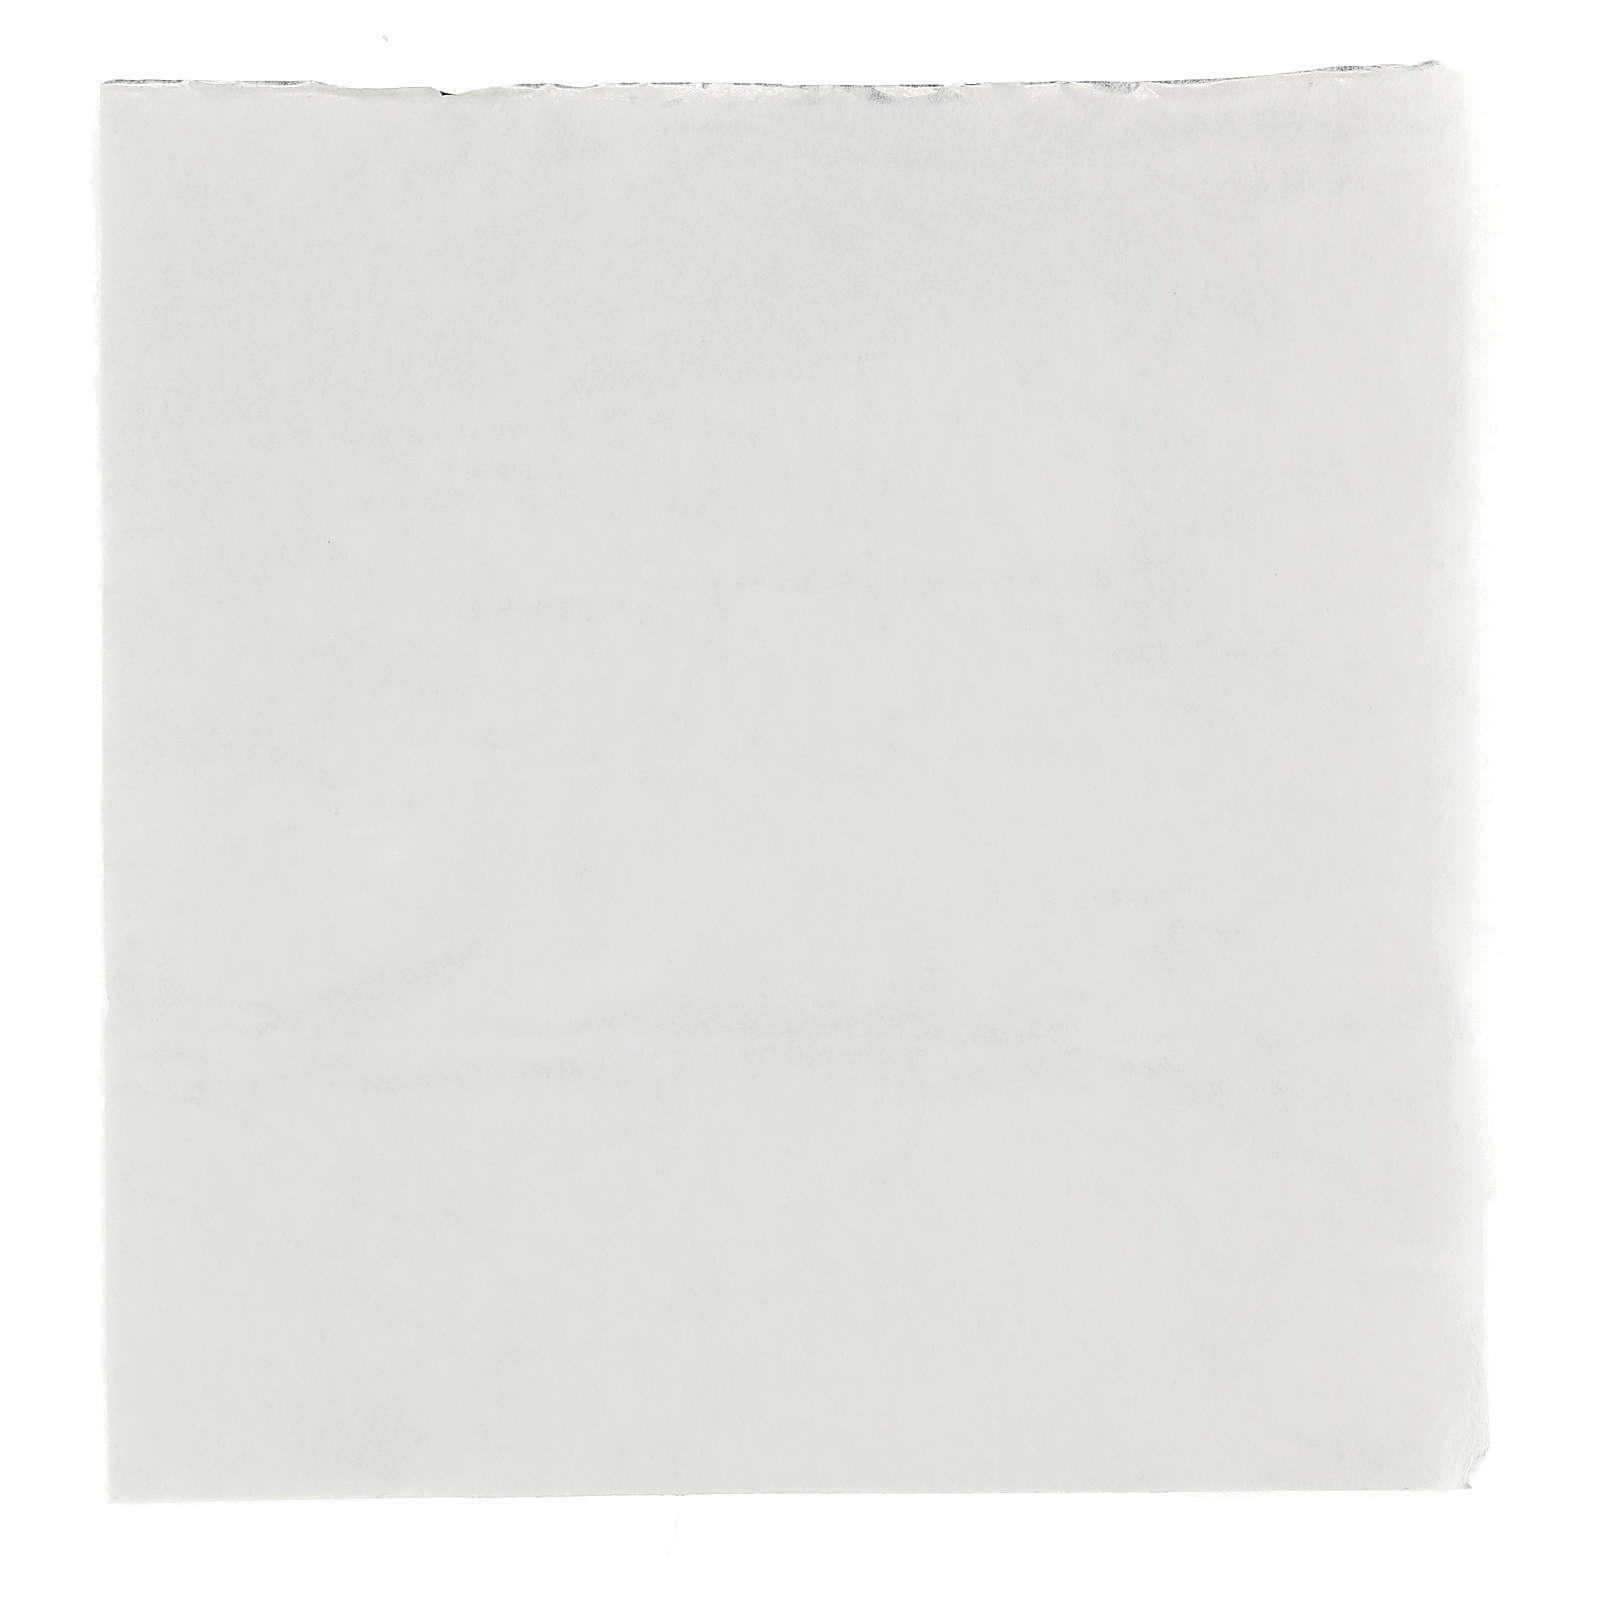 Snow paper for nativity scenes, moldable 30x30 cm 4